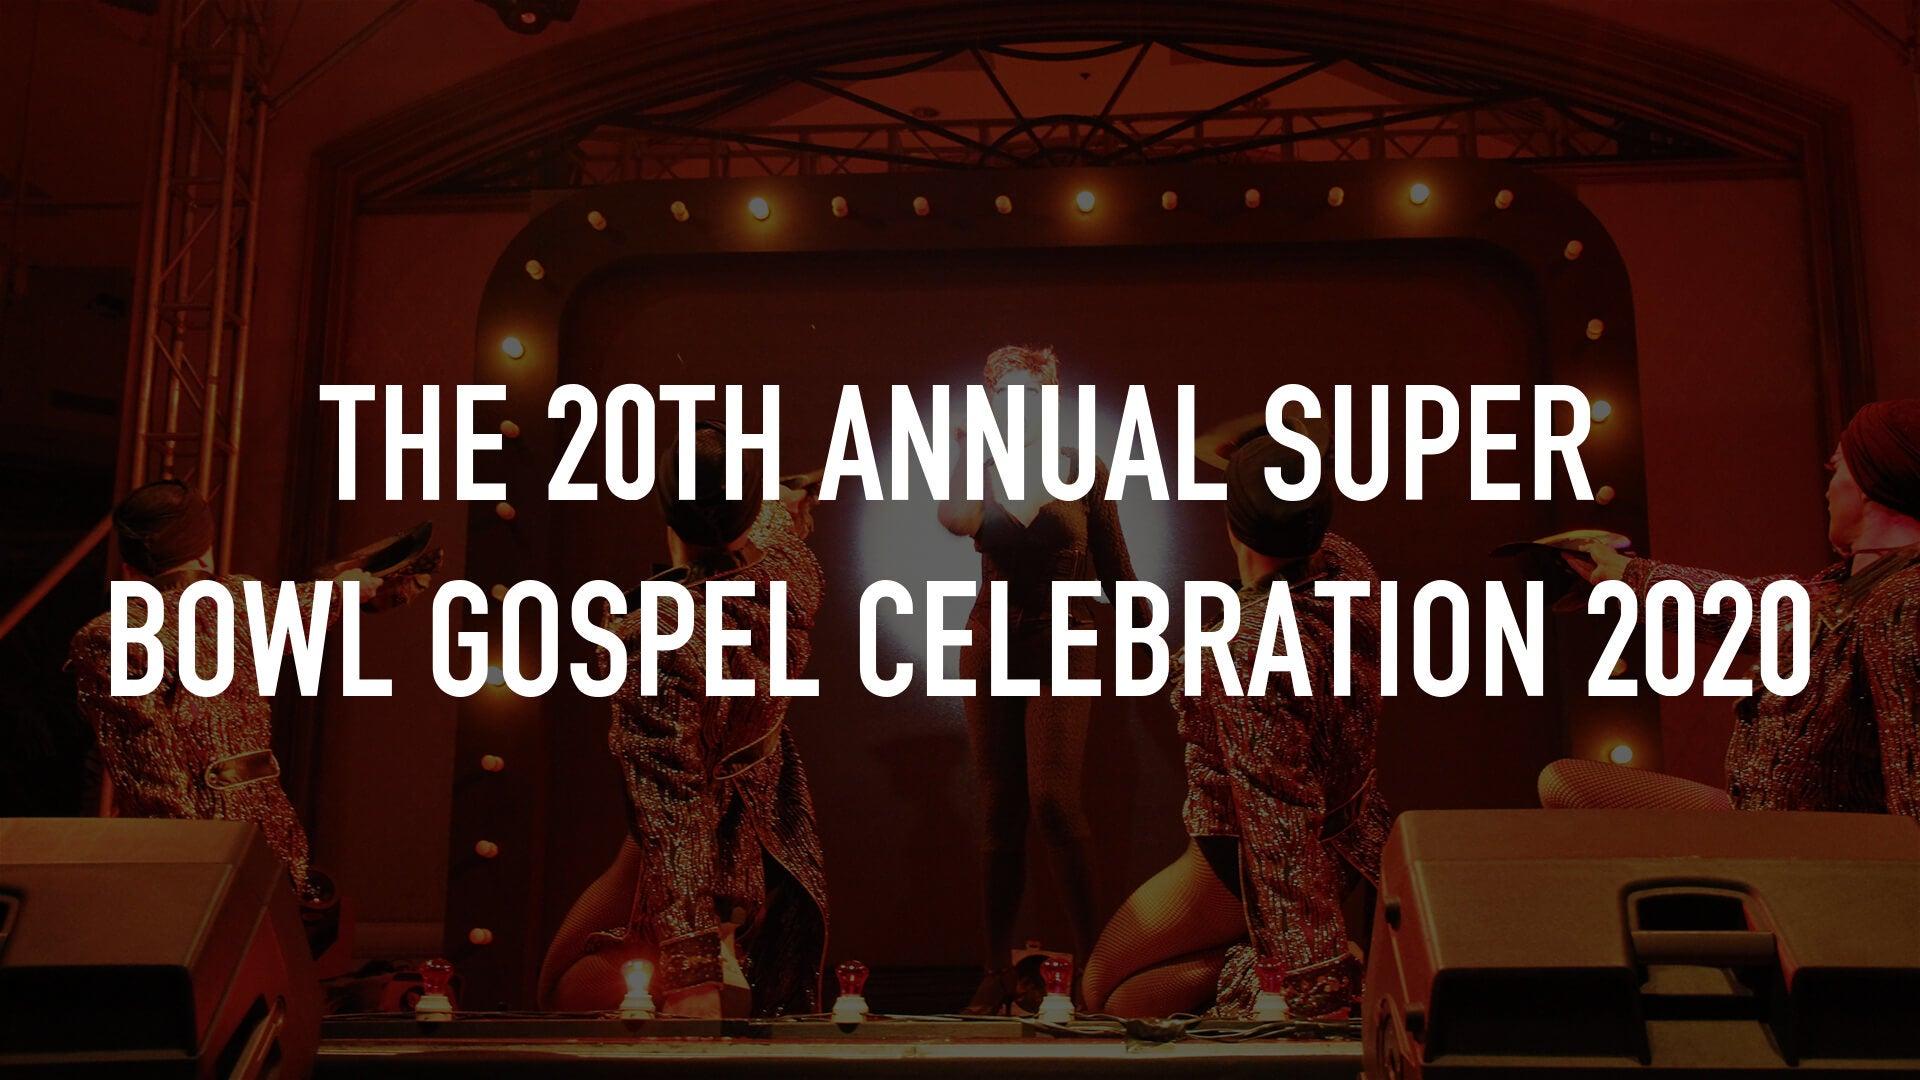 The 20th Annual Super Bowl Gospel Celebration 2020